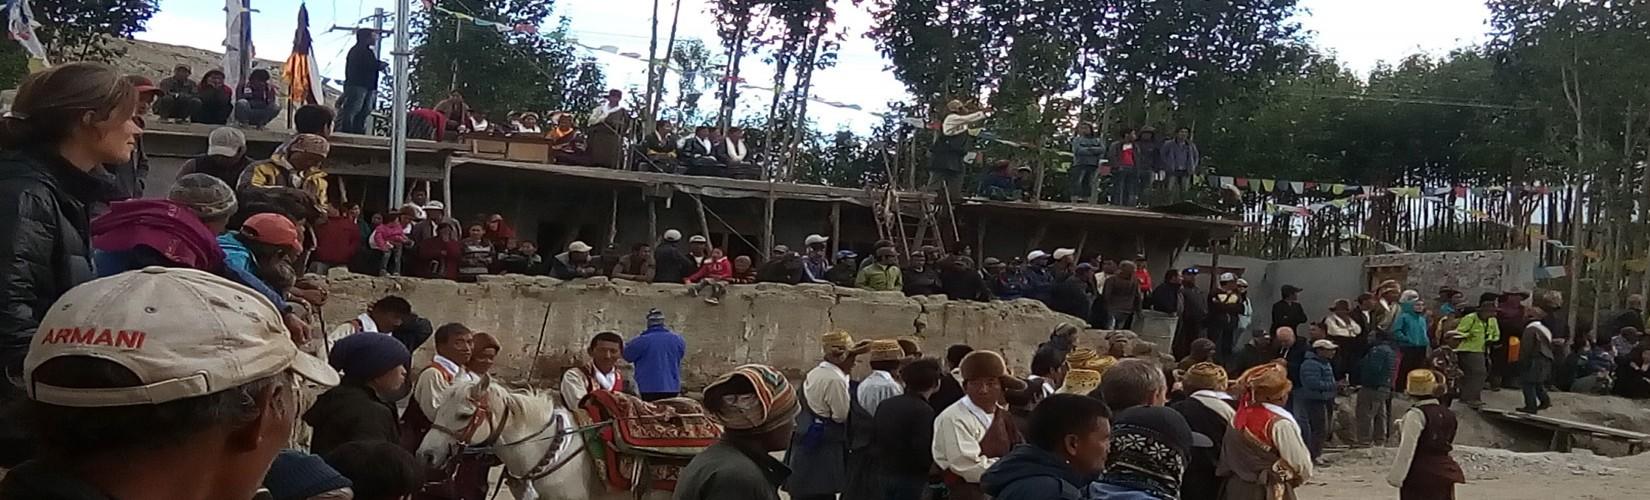 Upper Mustang Tiji Festival Trekking